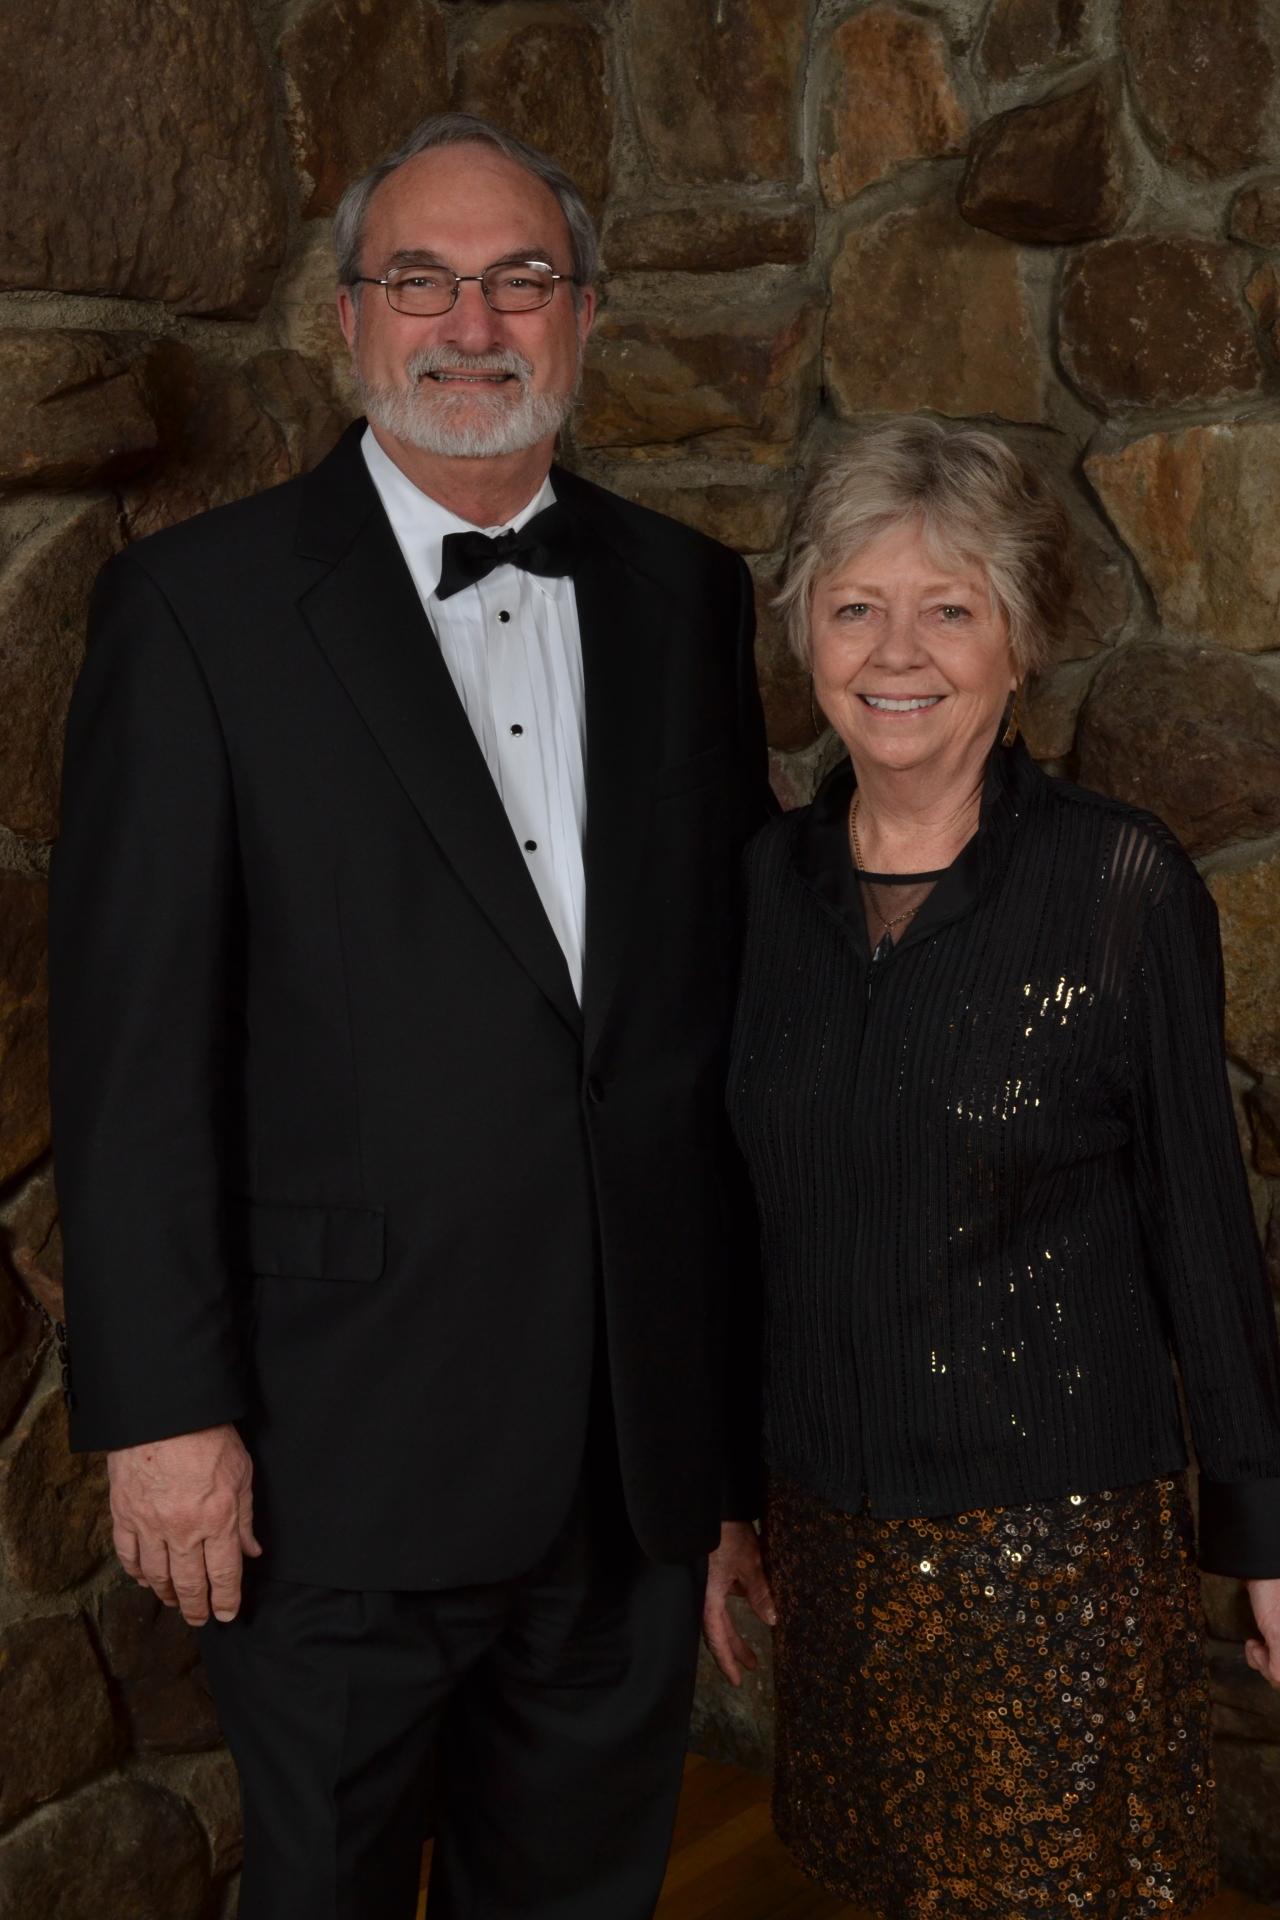 Robert and Carolyn